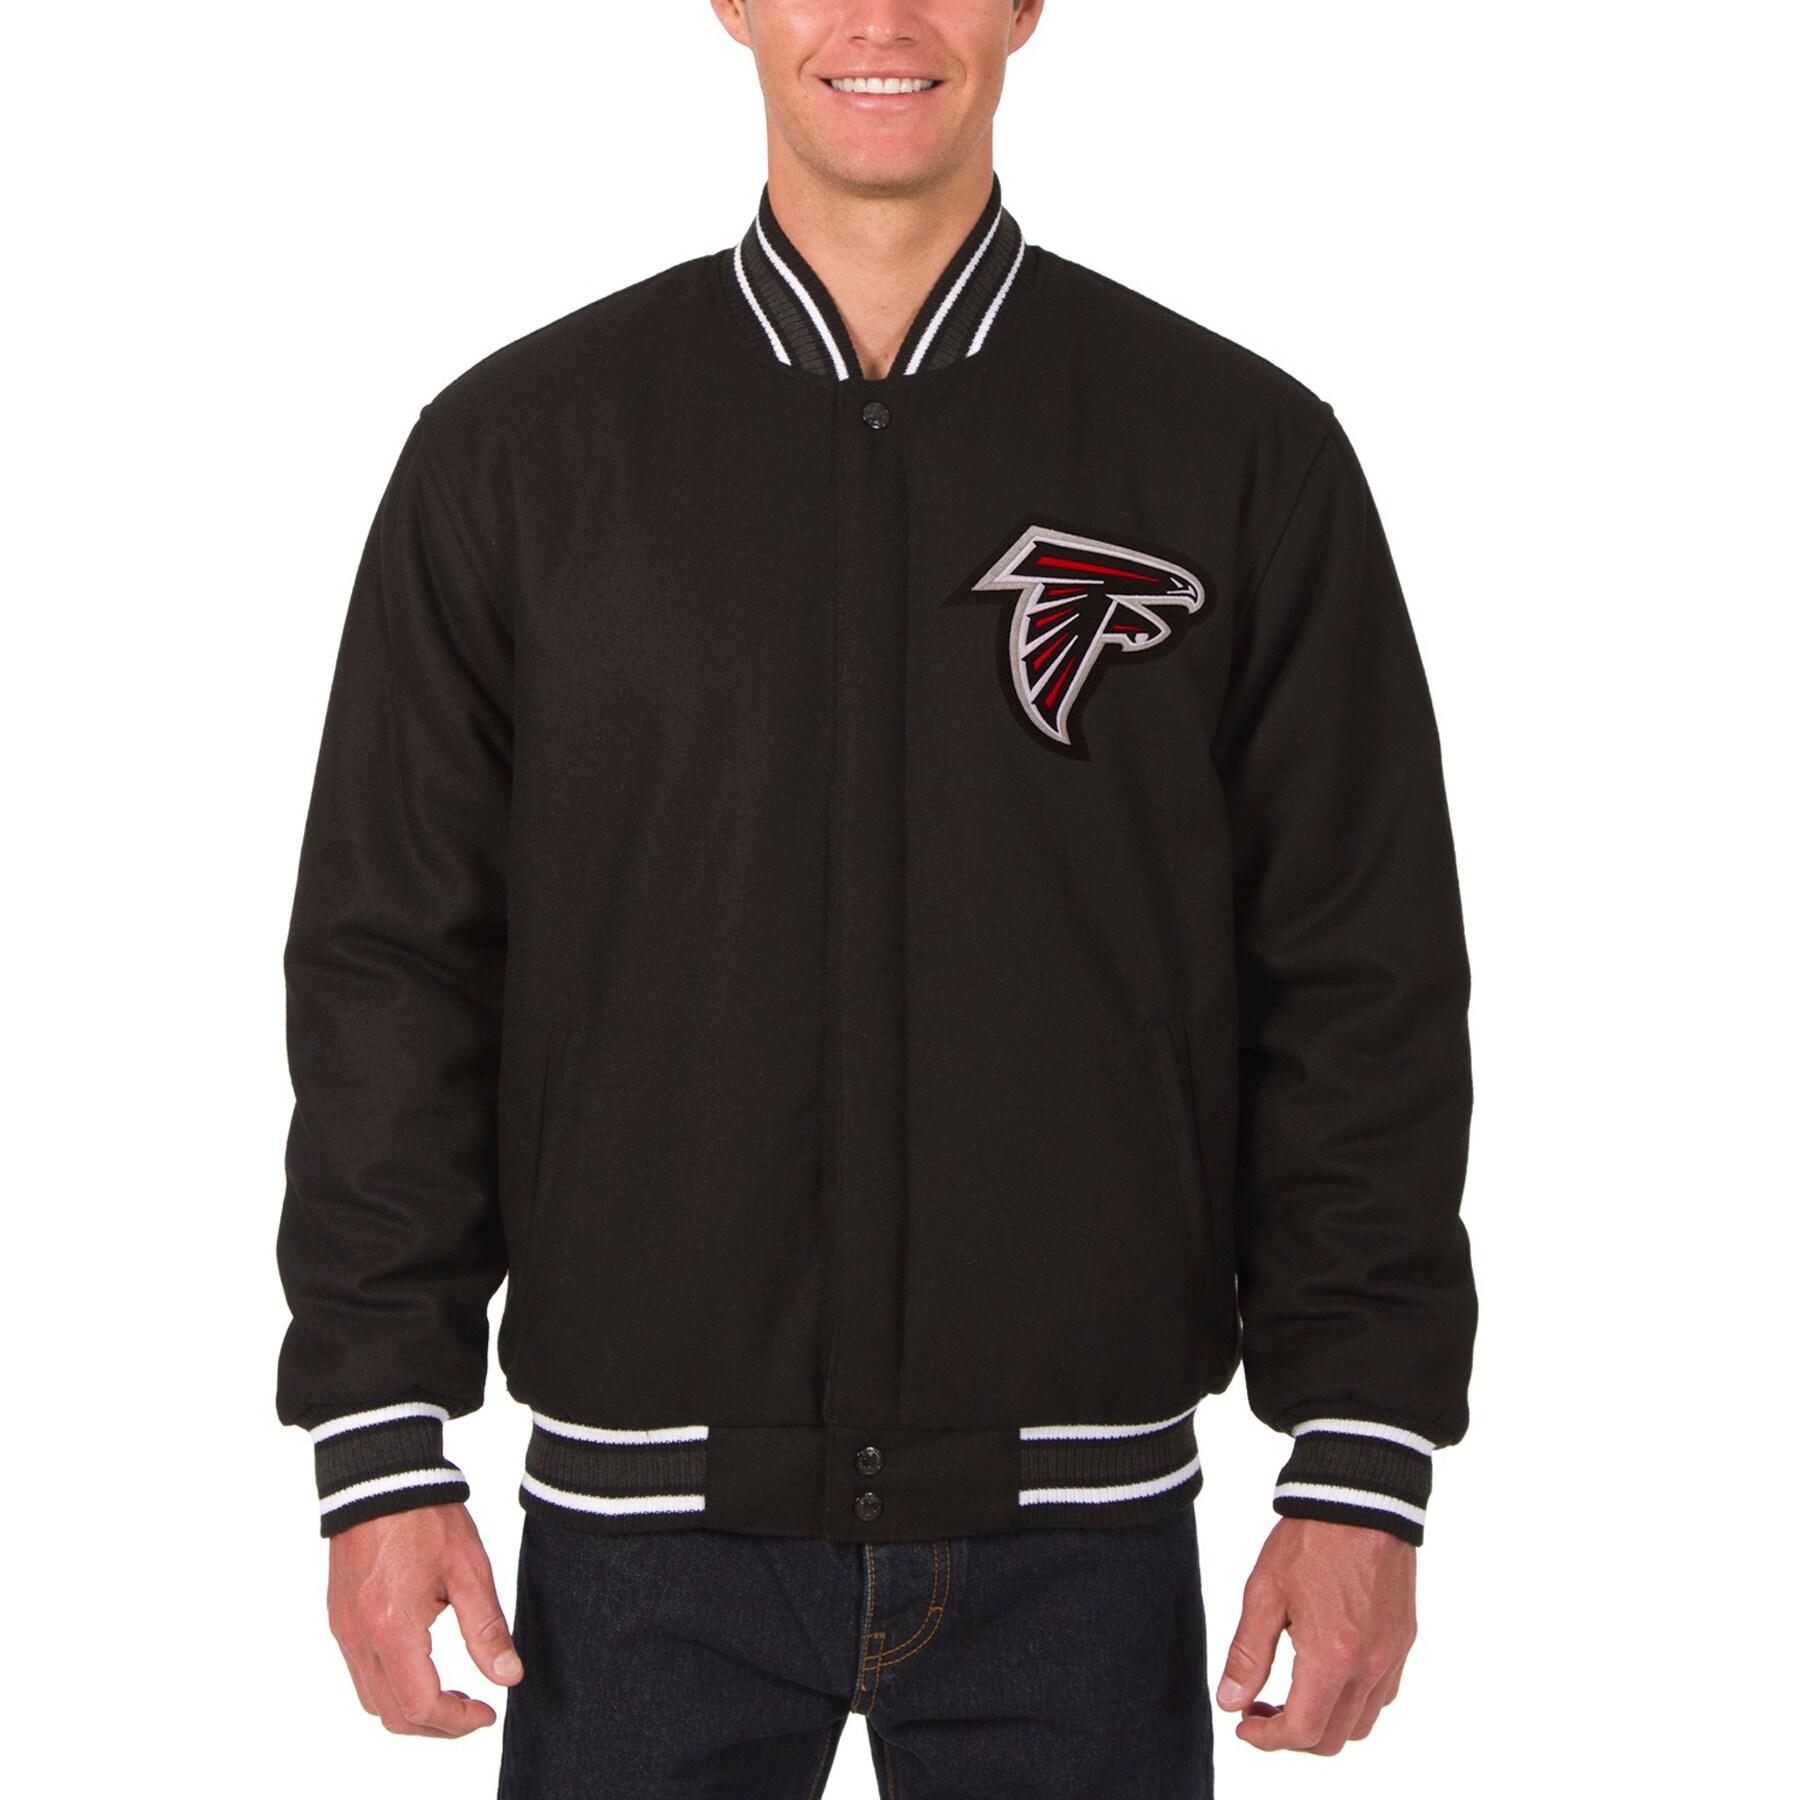 Atlanta Falcons JH Design Wool Reversible Jacket with Embroidered Logos - Black